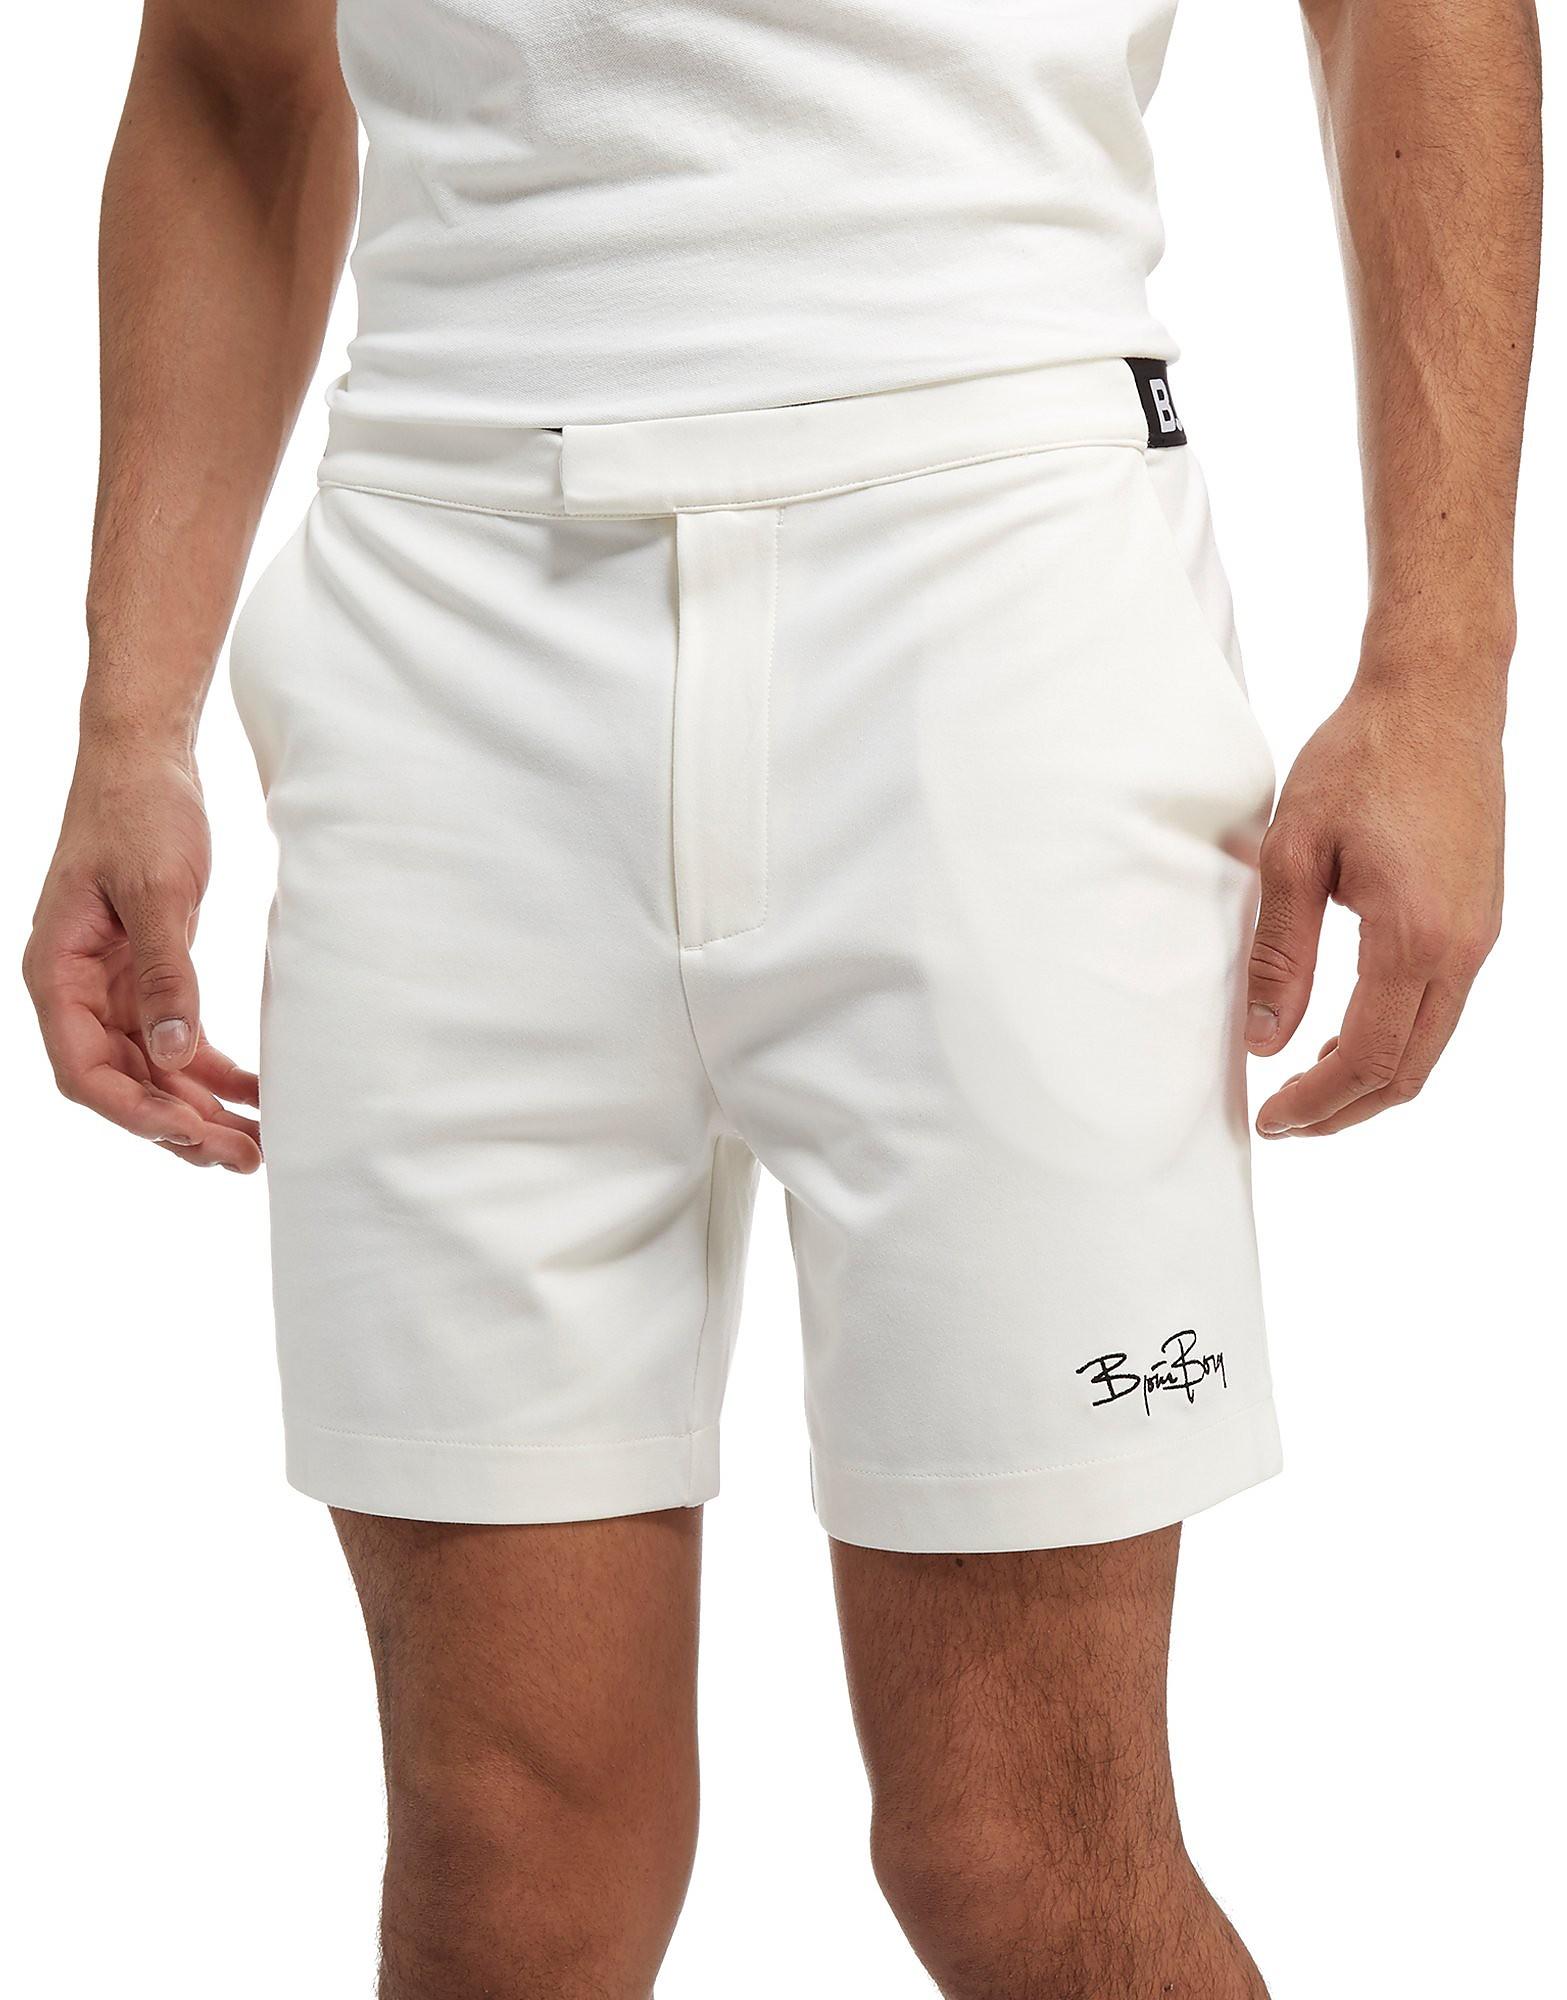 Bjorn Borg Signature '76 Shorts